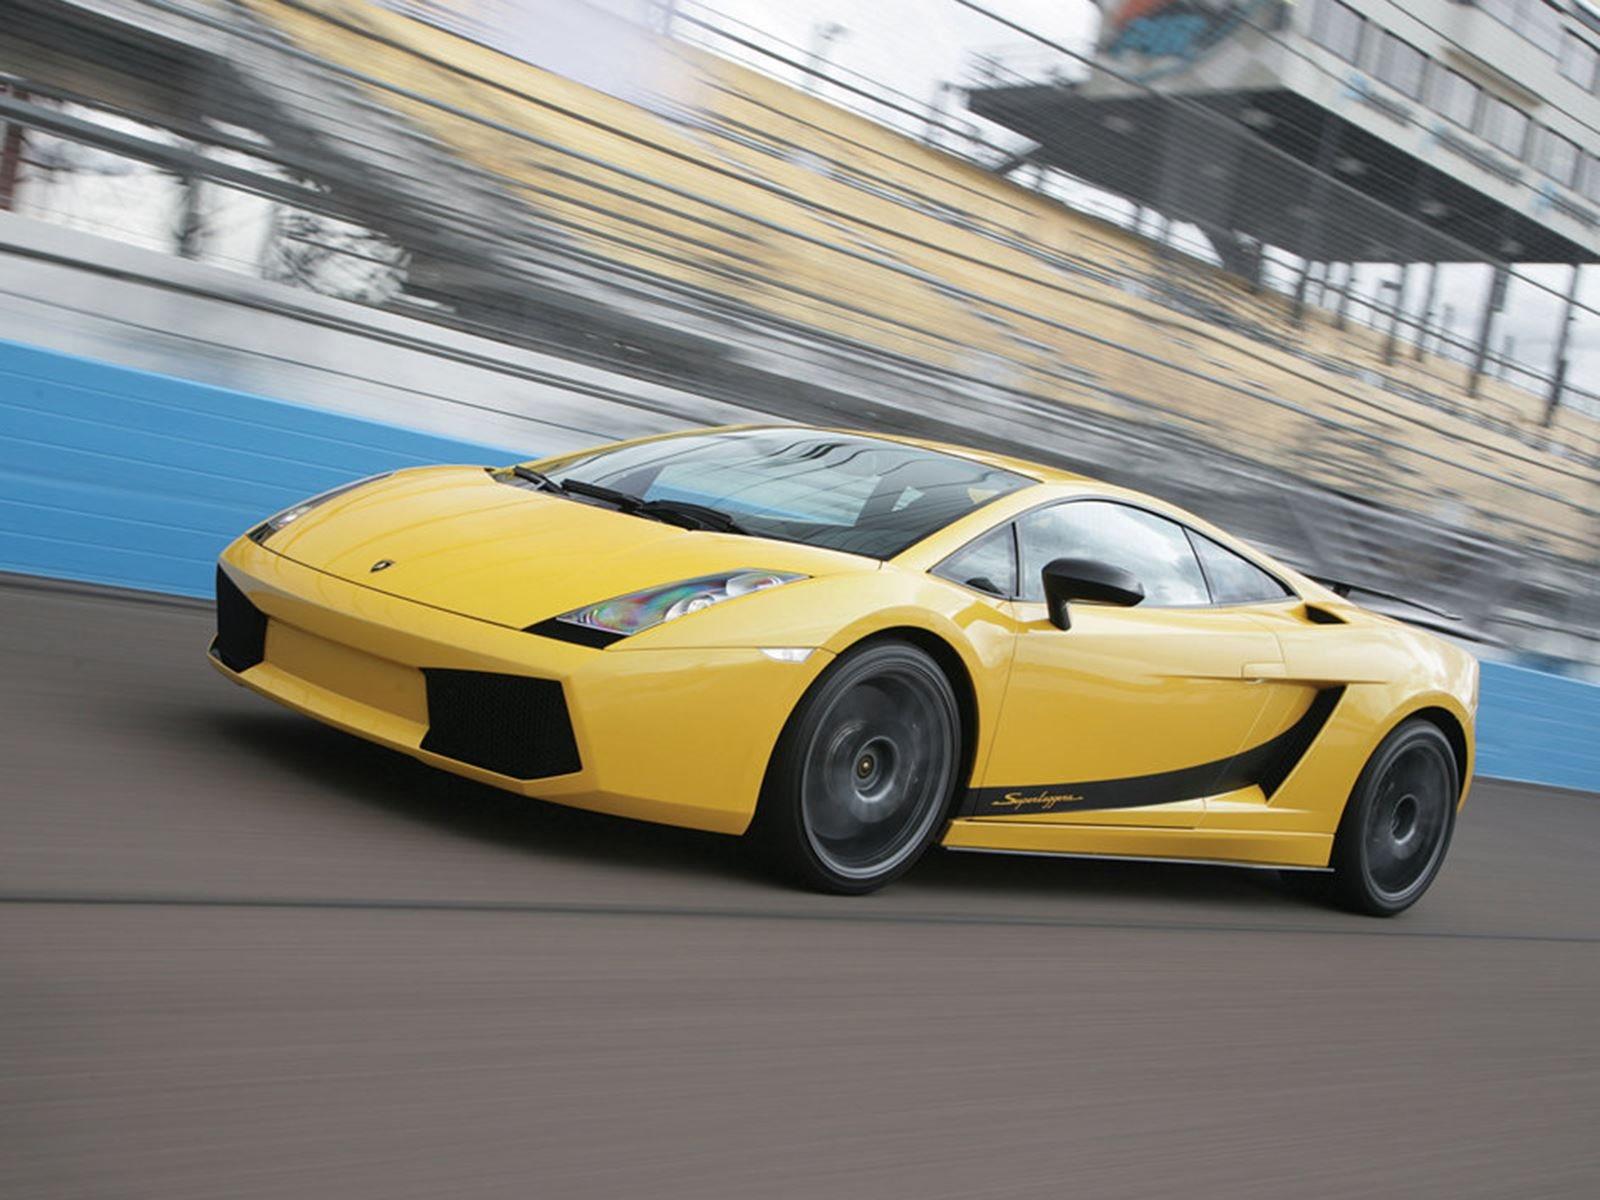 turbo dsc heffner muscle a cost of overview listings lamborghini gallardo twin vehicle real